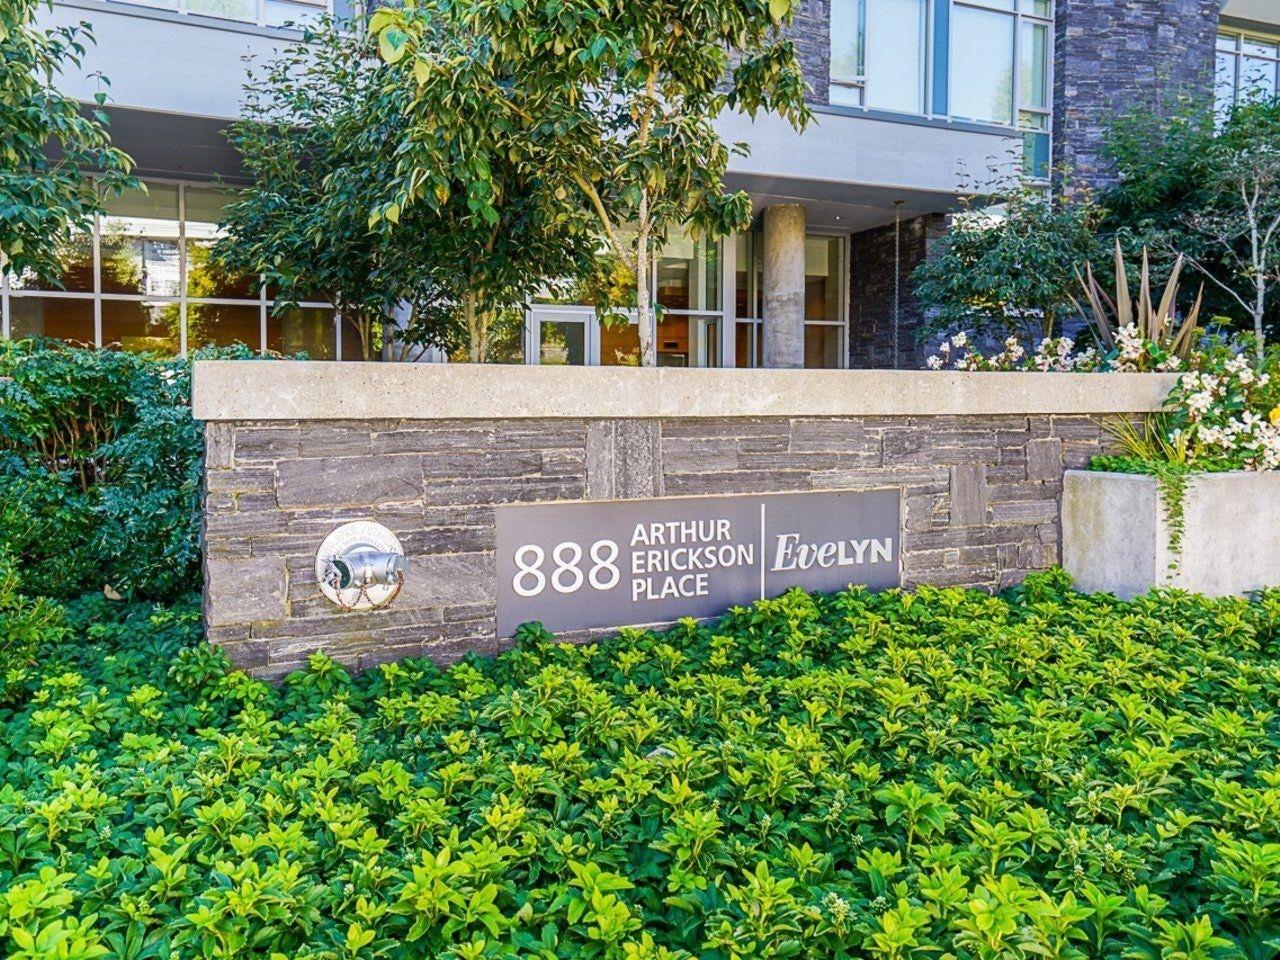 401 888 ARTHUR ERICKSON PLACE - Park Royal Apartment/Condo for sale, 2 Bedrooms (R2616631) - #1